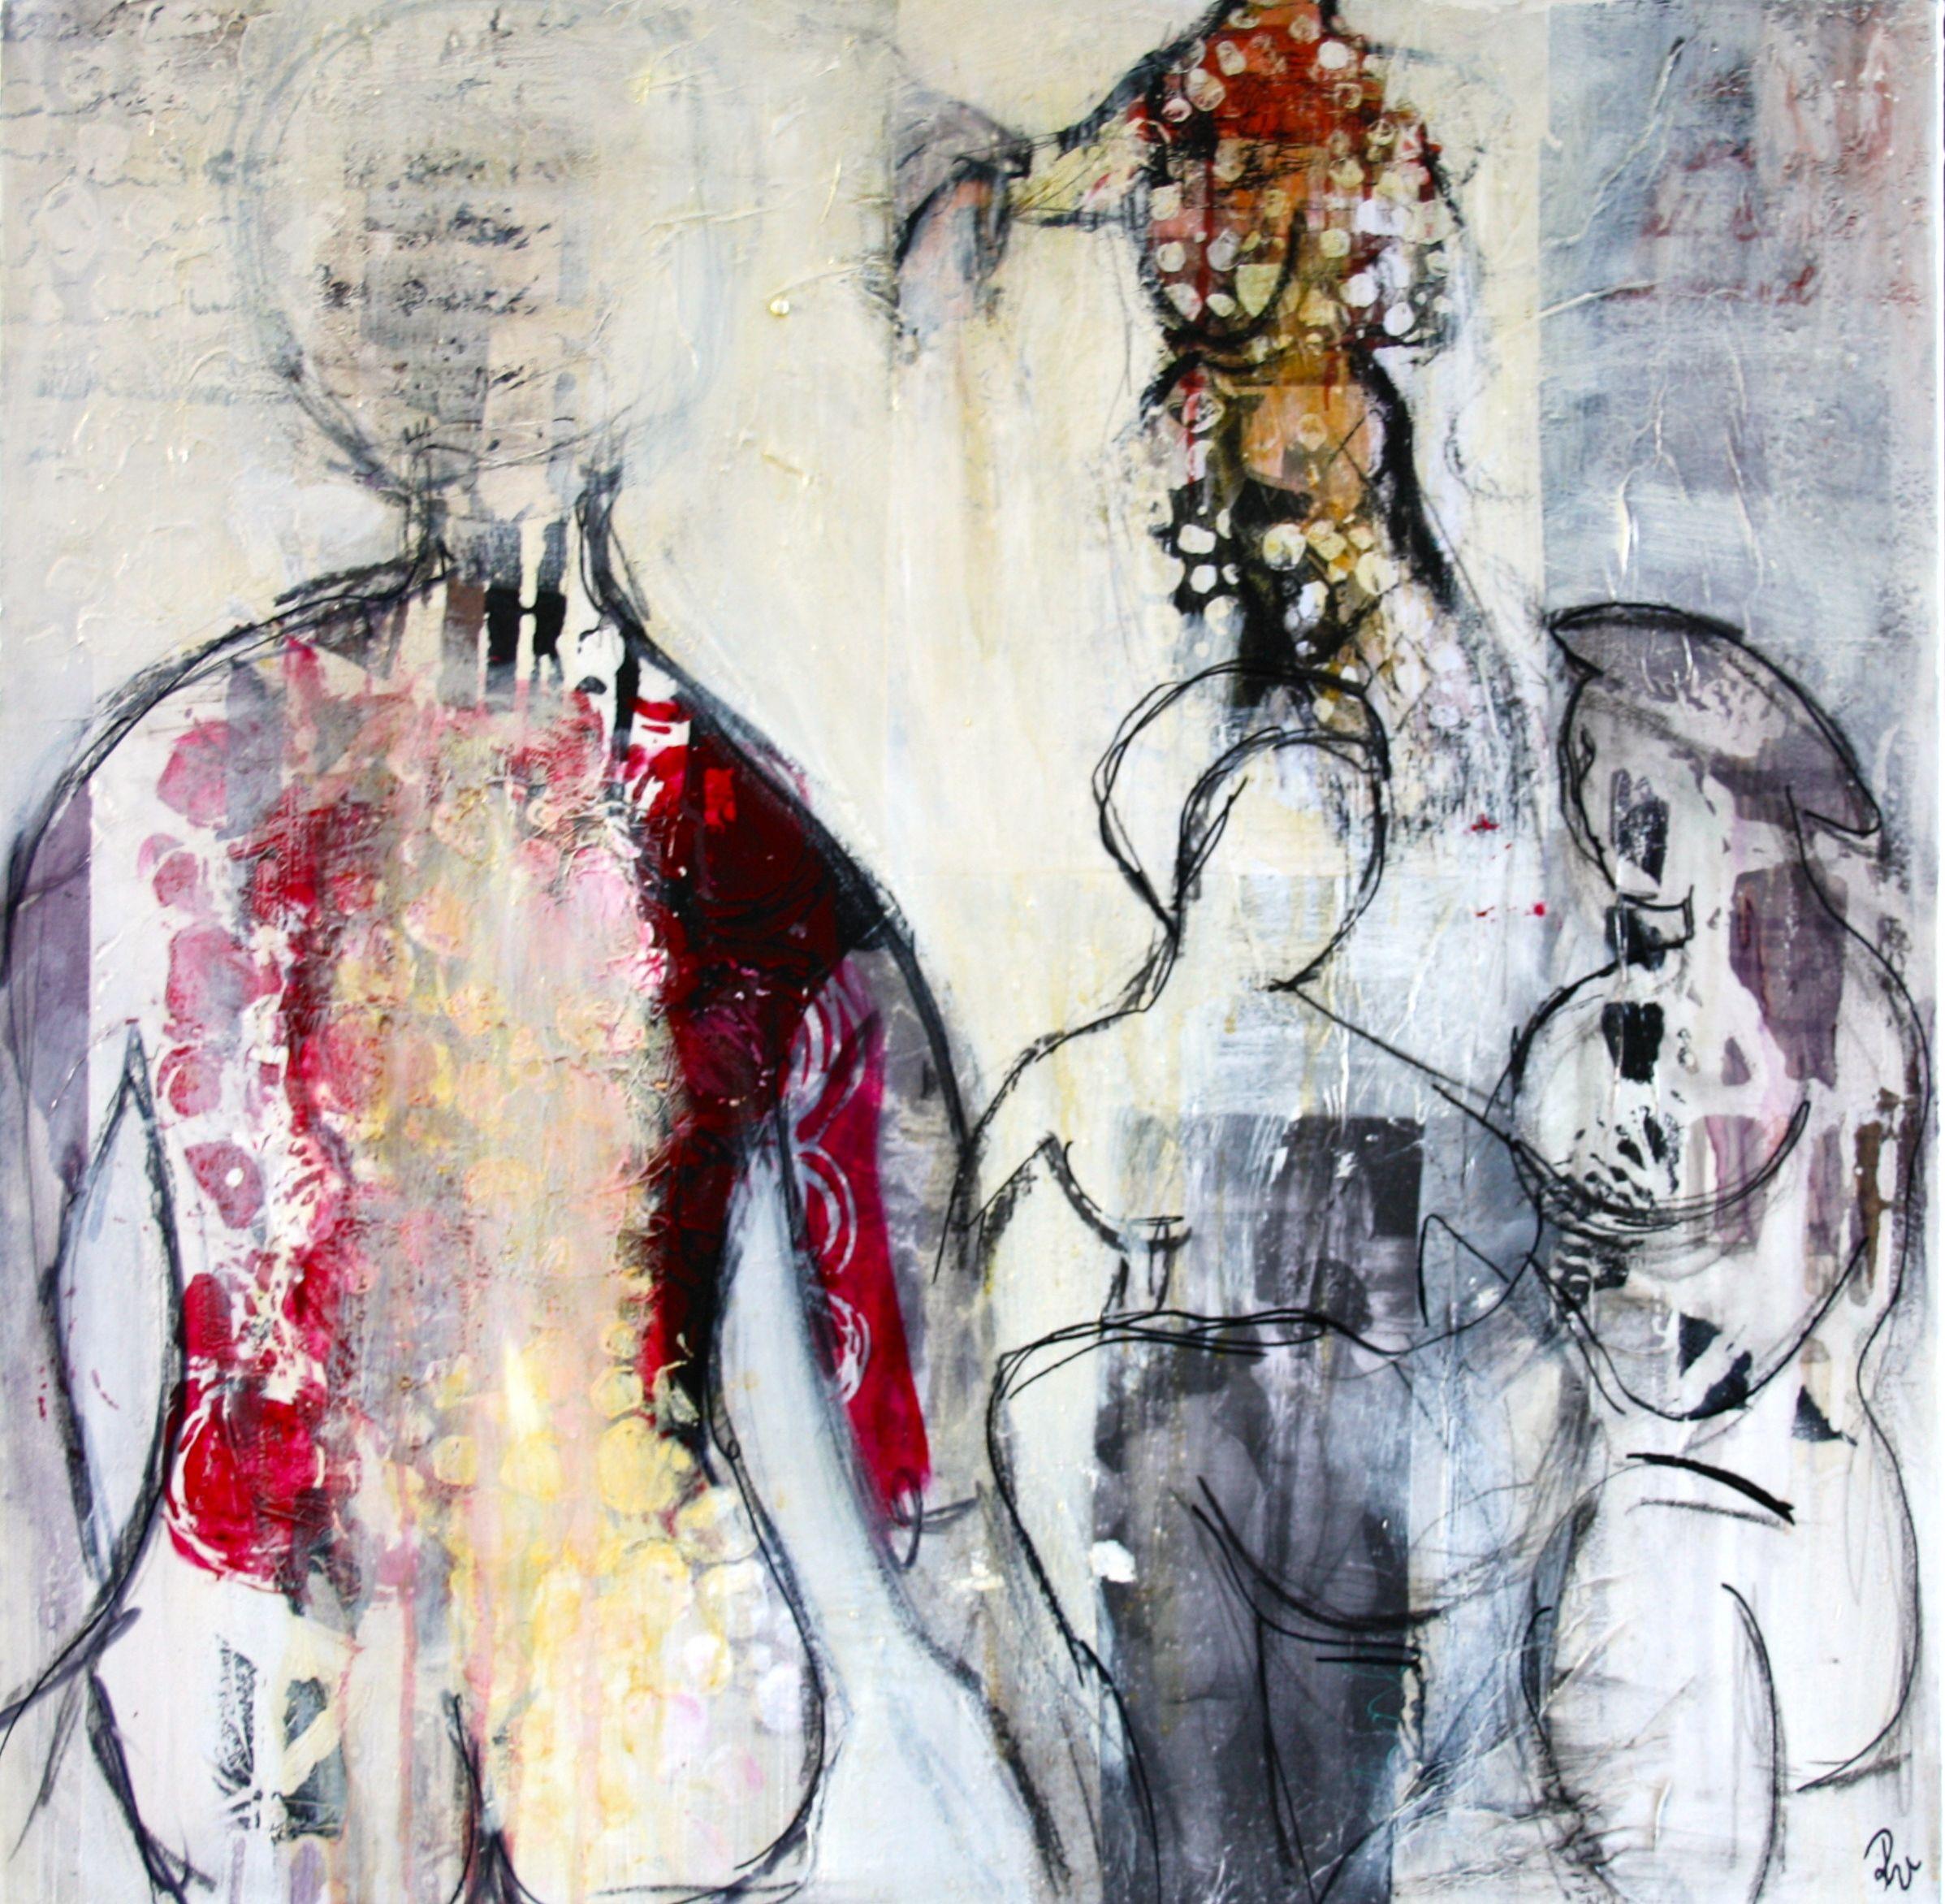 Mennesker Akryl Oilpastel Collage Papir Serigrafitryk Kul Blyant Tegning Maleri Galleri Www Rieskunstgalleri Dk Portraet Tegning Malerier Tegning